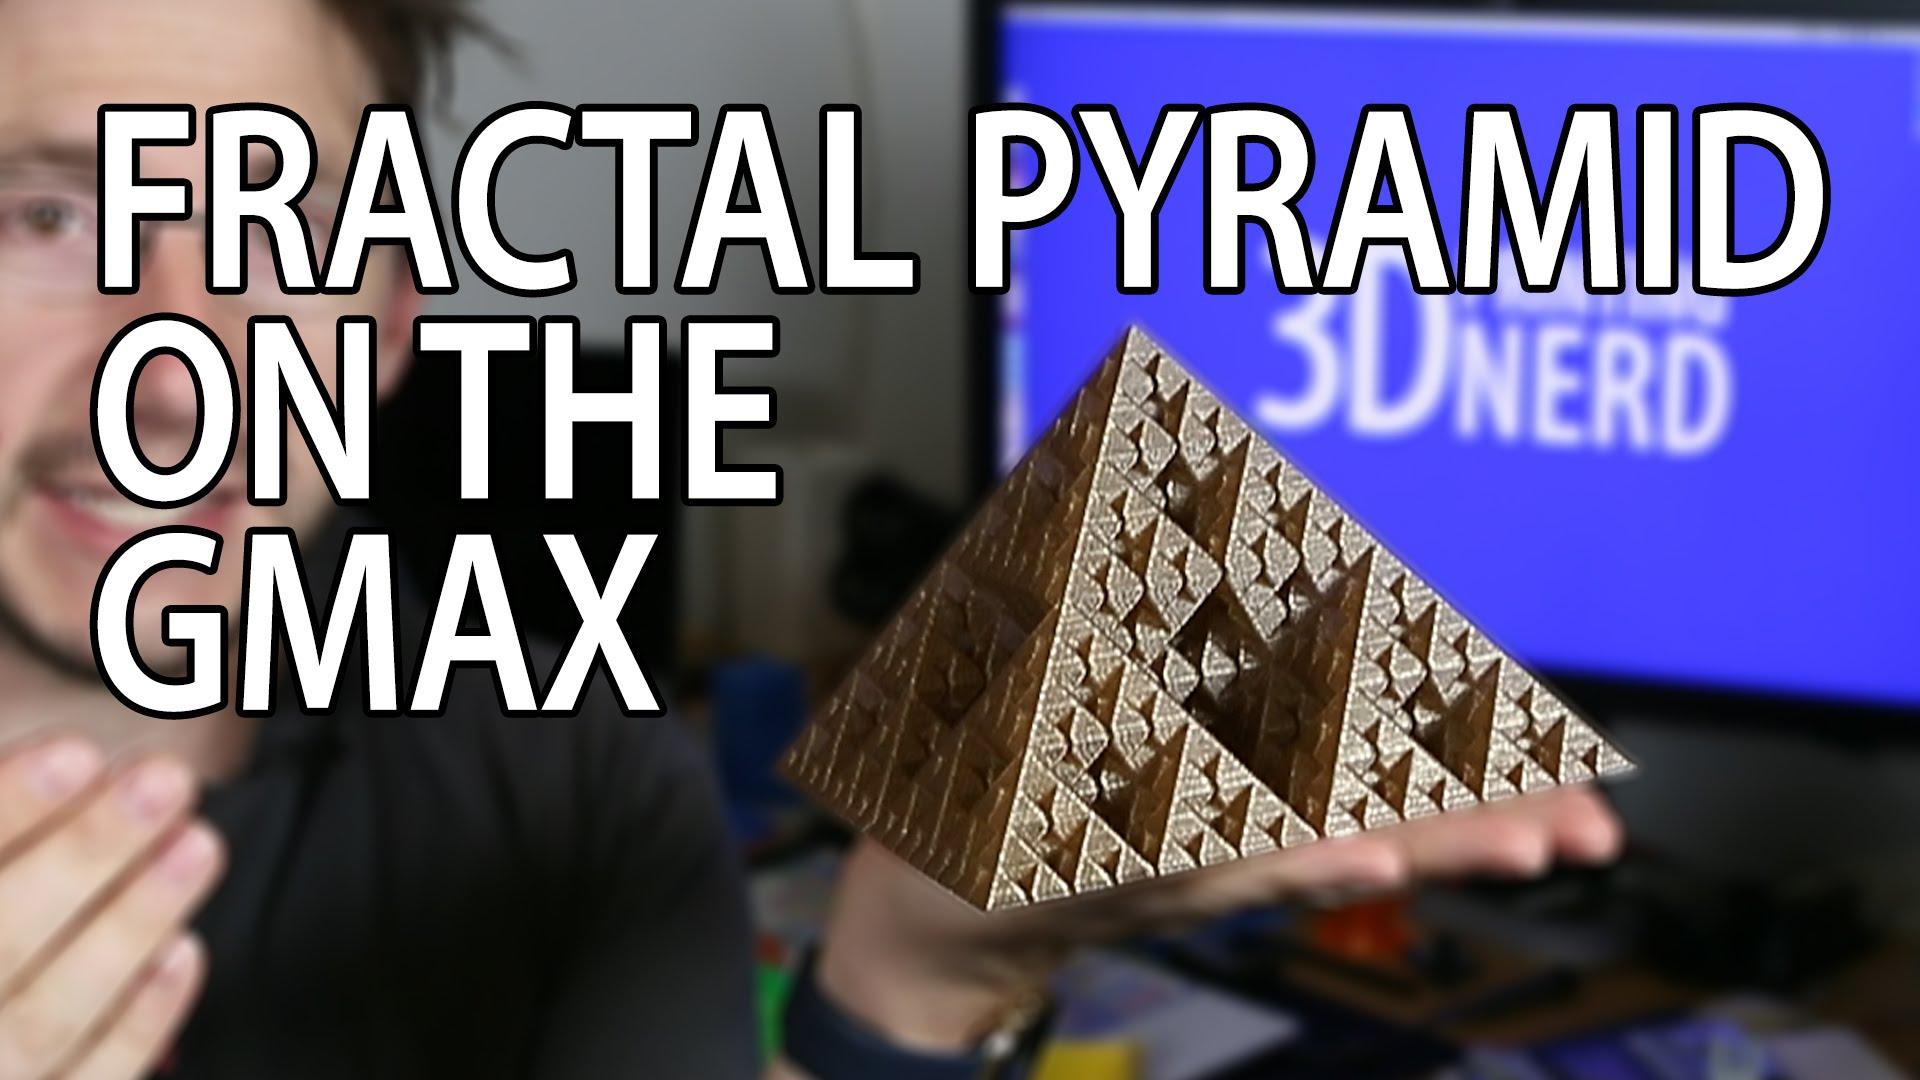 3D Printing: Fractal Pyramid on gMax 1.5XT+ using Proto Pasta PLA